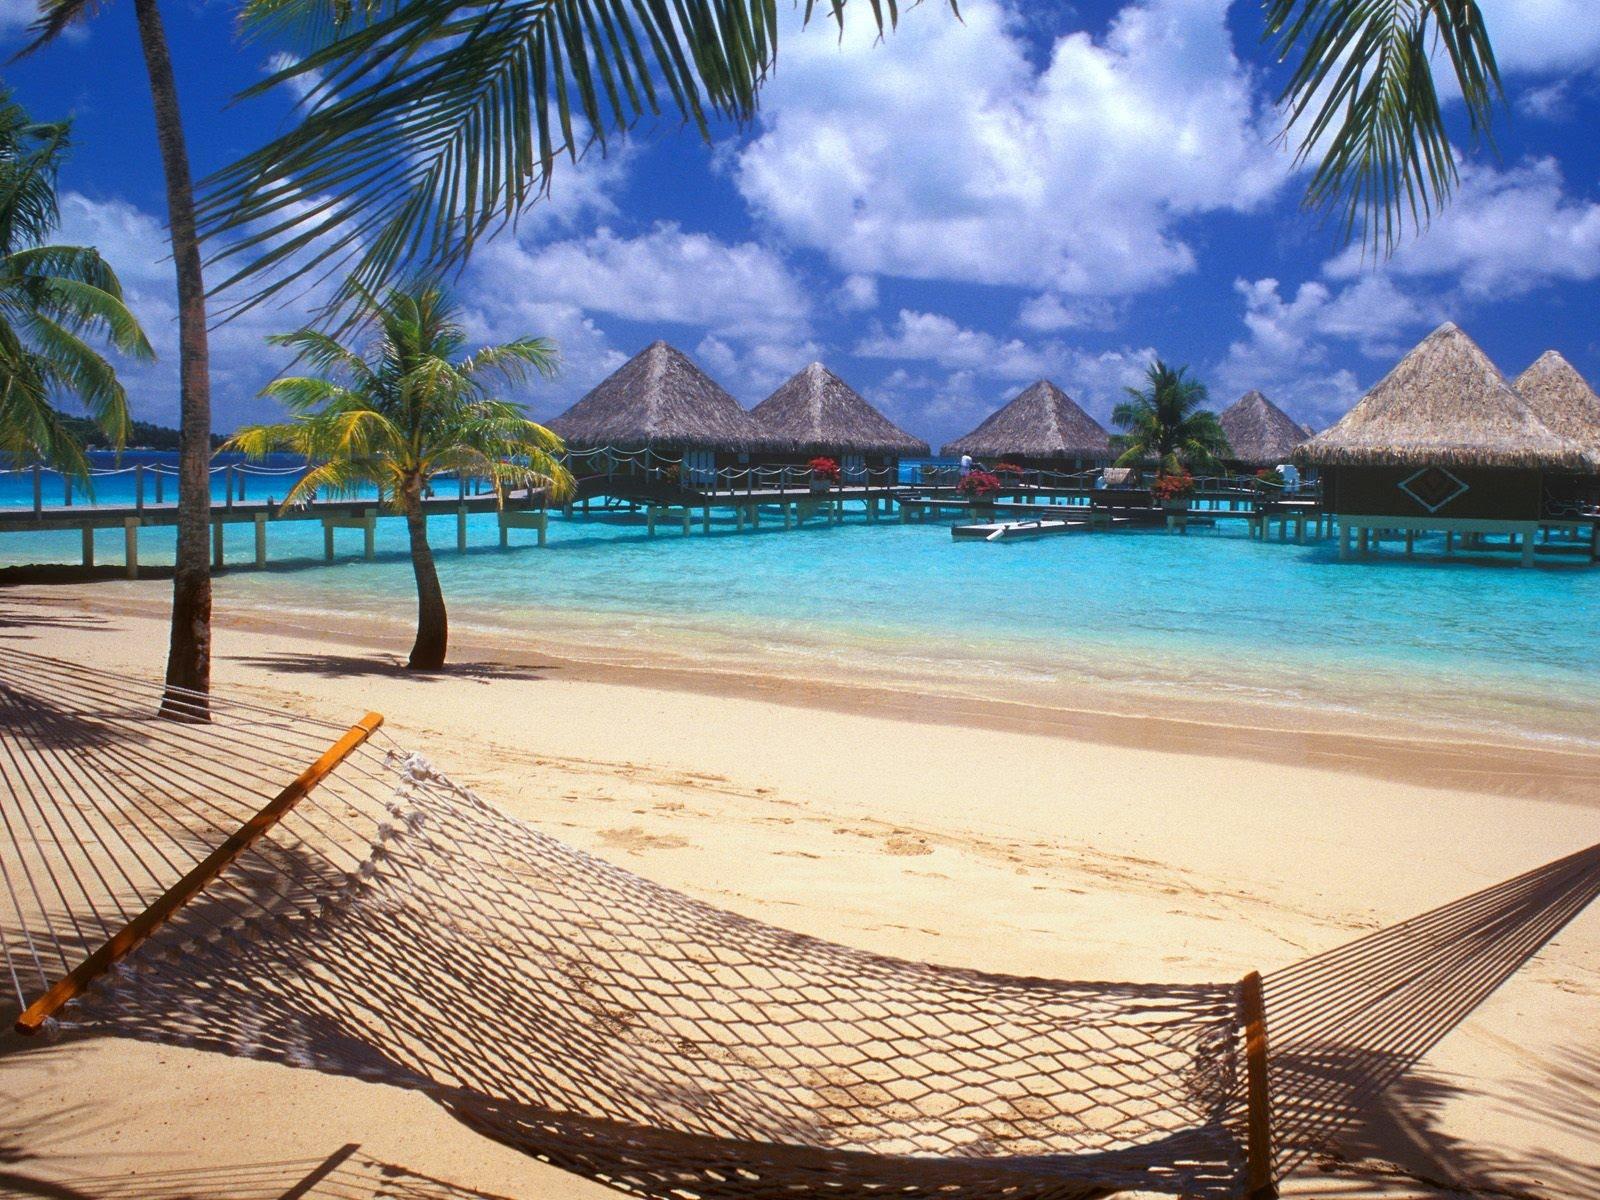 Bora Bora  Travel Wallpapers Hd Desktop Wallpaper 1600x1200